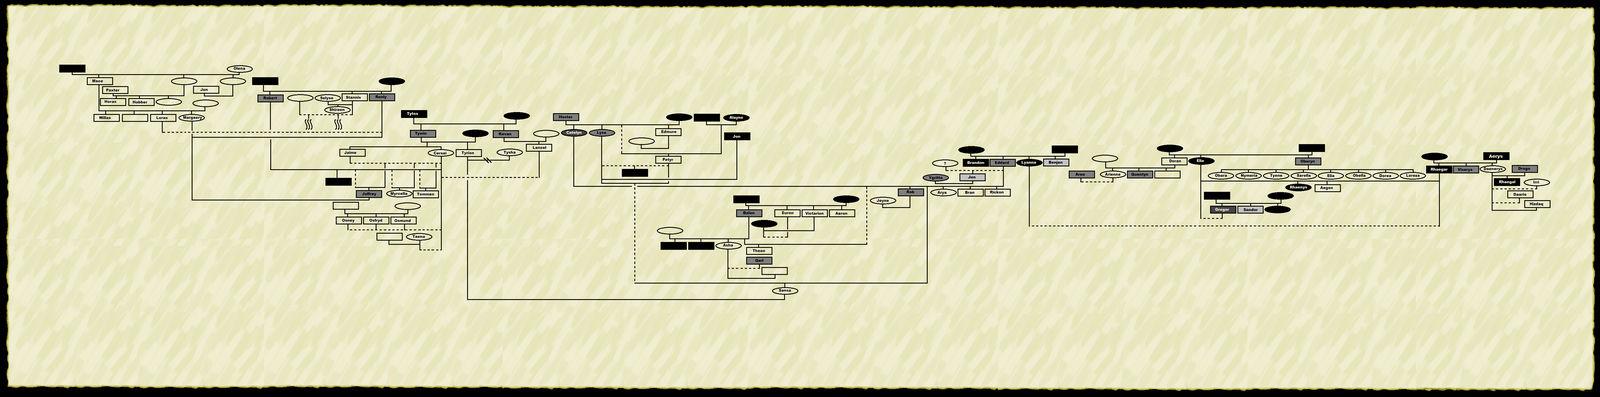 ASOIAF Family Tree